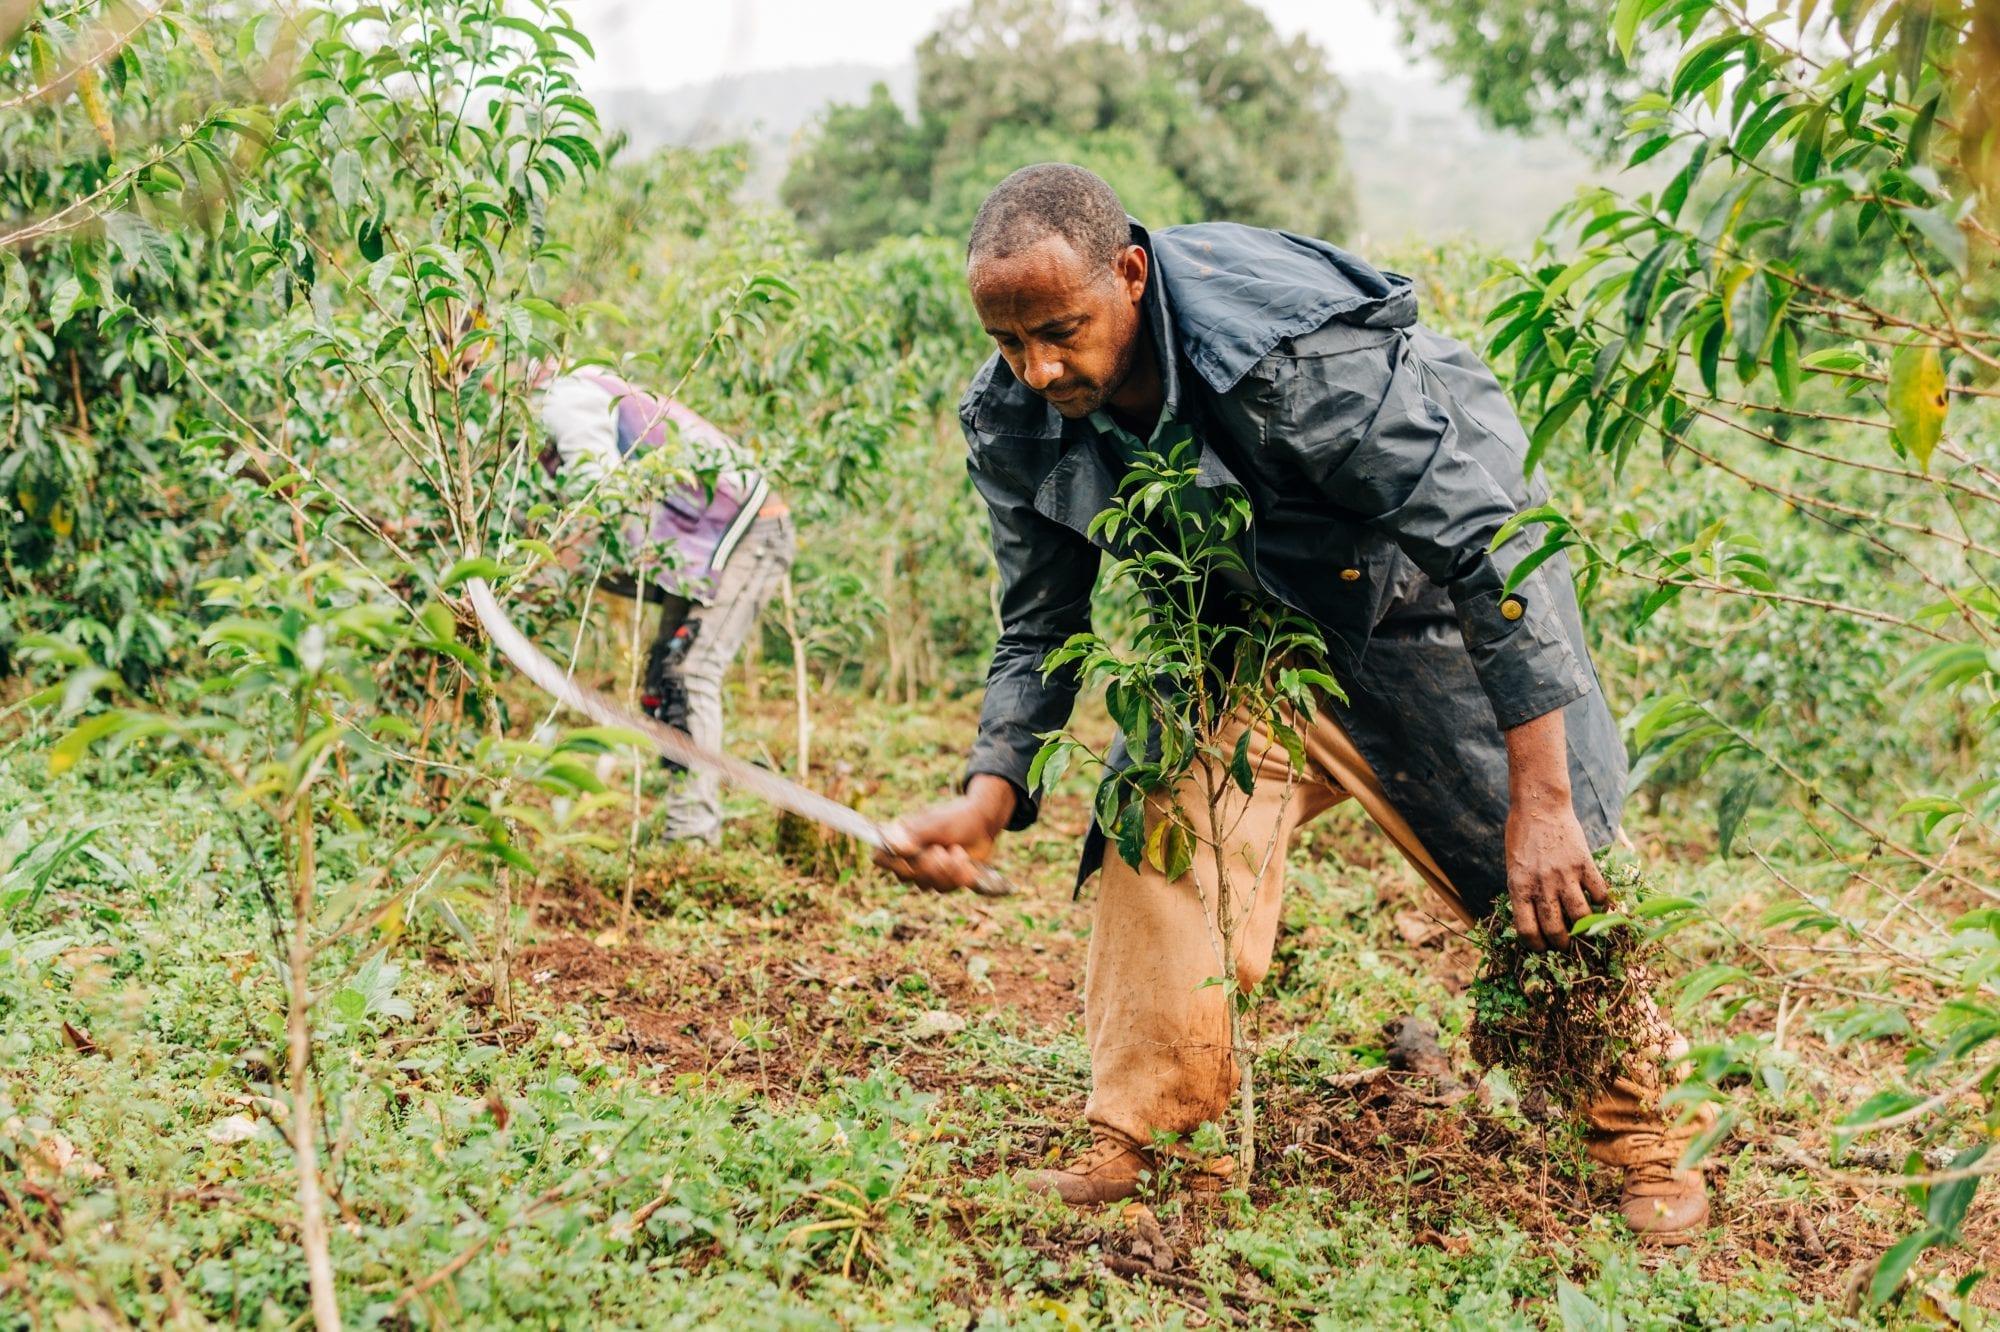 A coffee farmer in Ethiopia tends to his farm